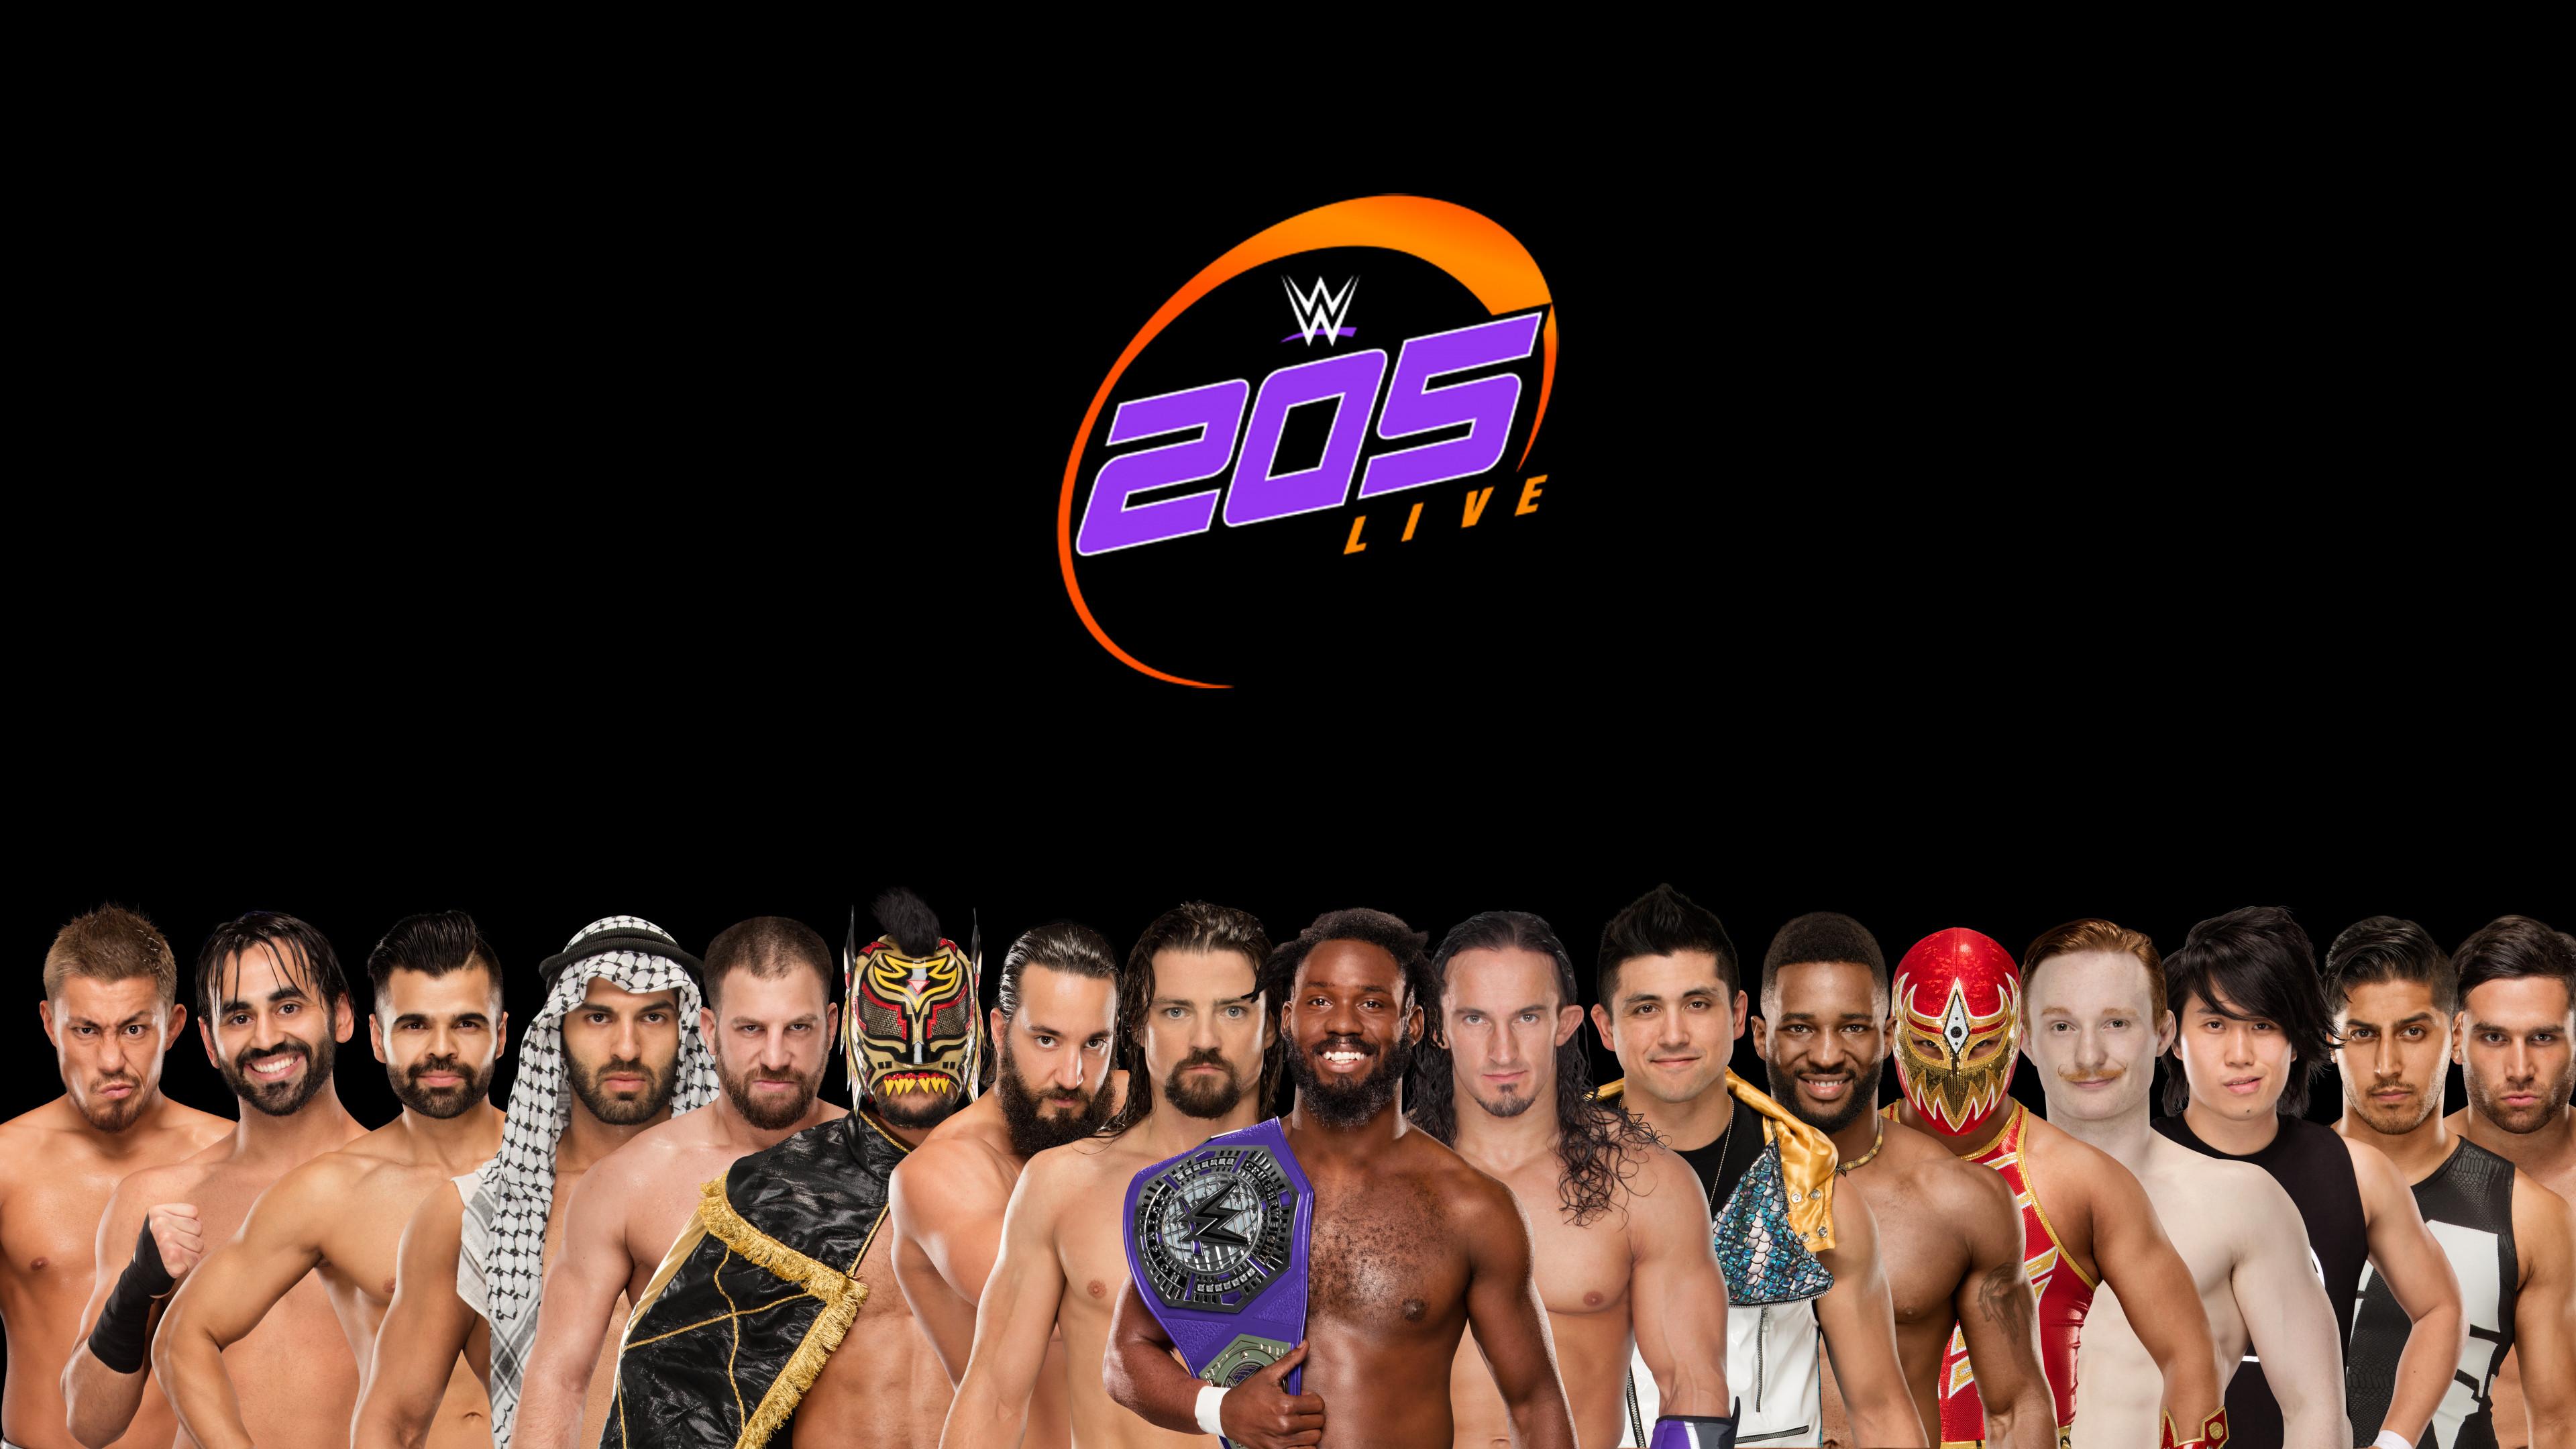 Album of Wallpapers Rendered from Renders from WWE.com Superstar Renders.